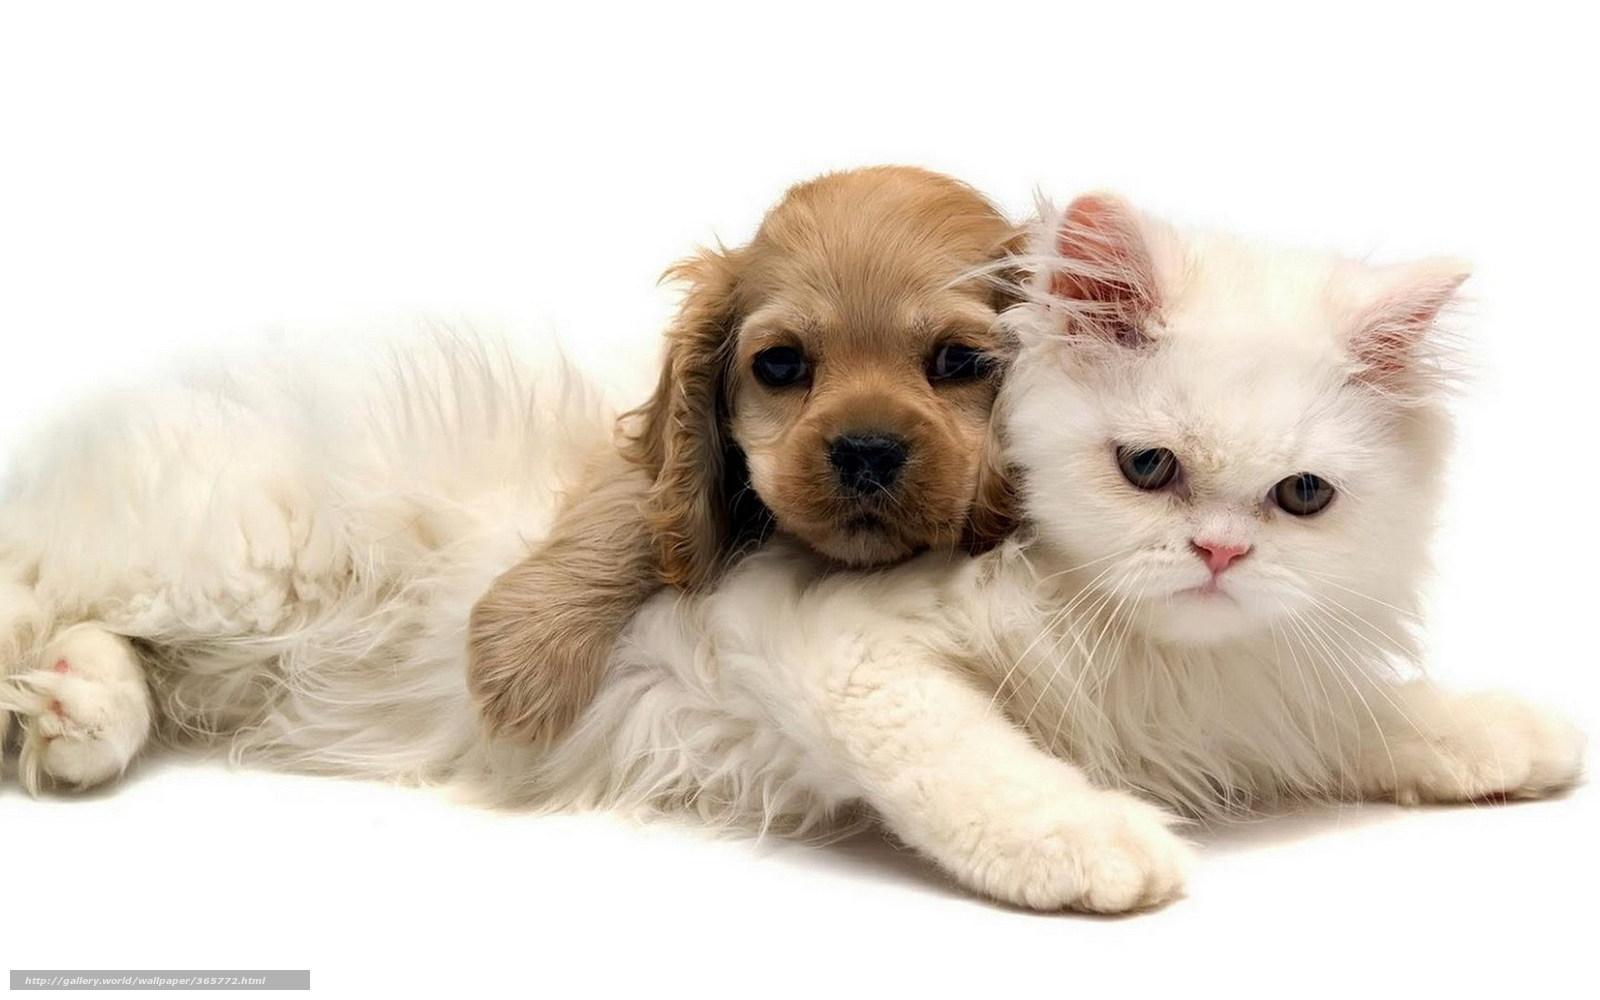 Tlcharger fond d 39 ecran chaton chiot animaux fonds d for Fond ecran chiot